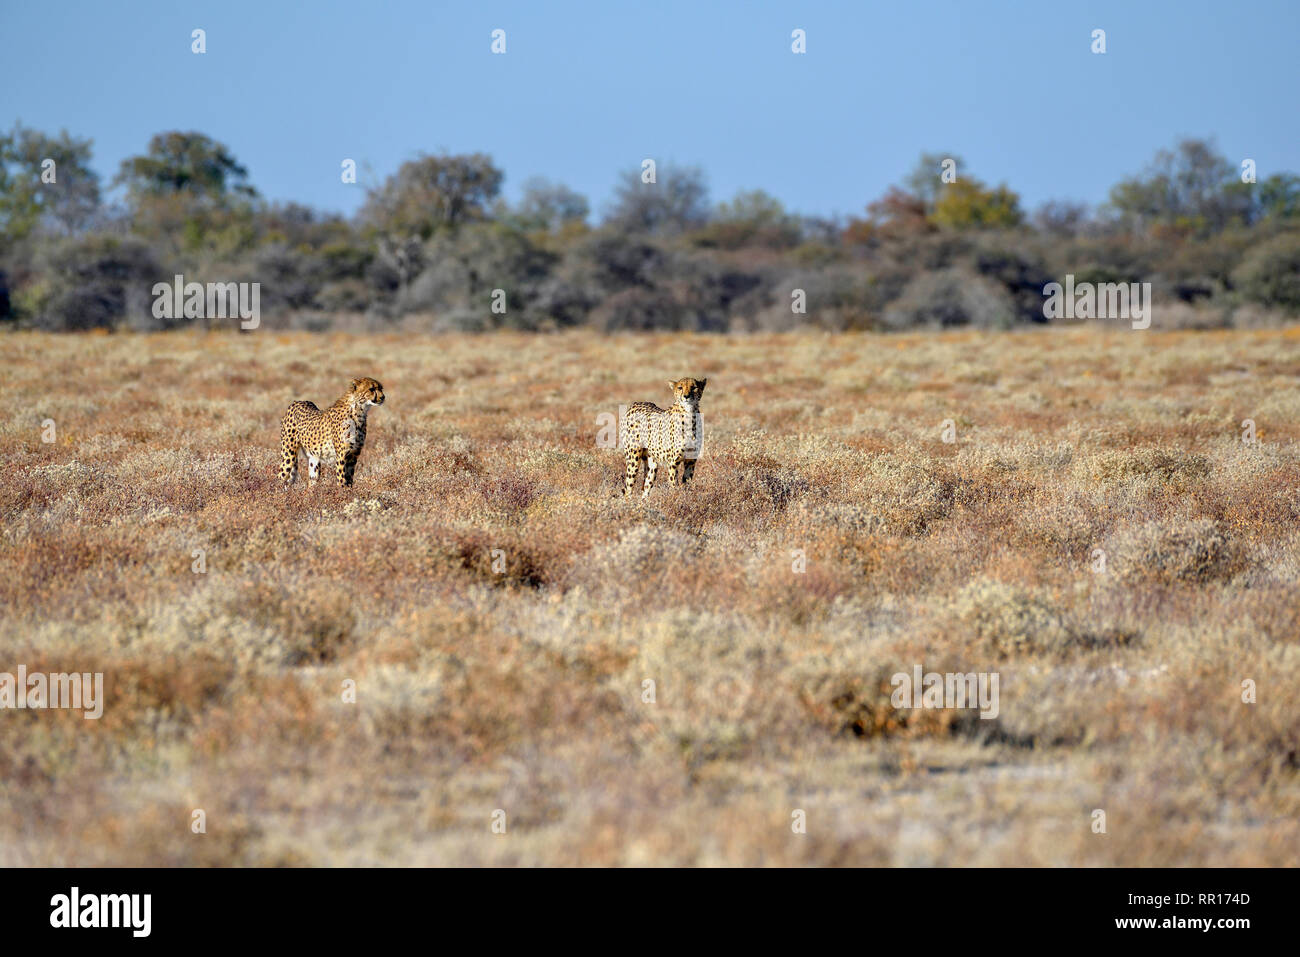 Zoologia, mammifero (mammalia), due ghepardi (Acinonyx jubatus), animali maschili, da Namutoni, Etosha Na, Additional-Rights-Clearance-Info-Not-Available Immagini Stock